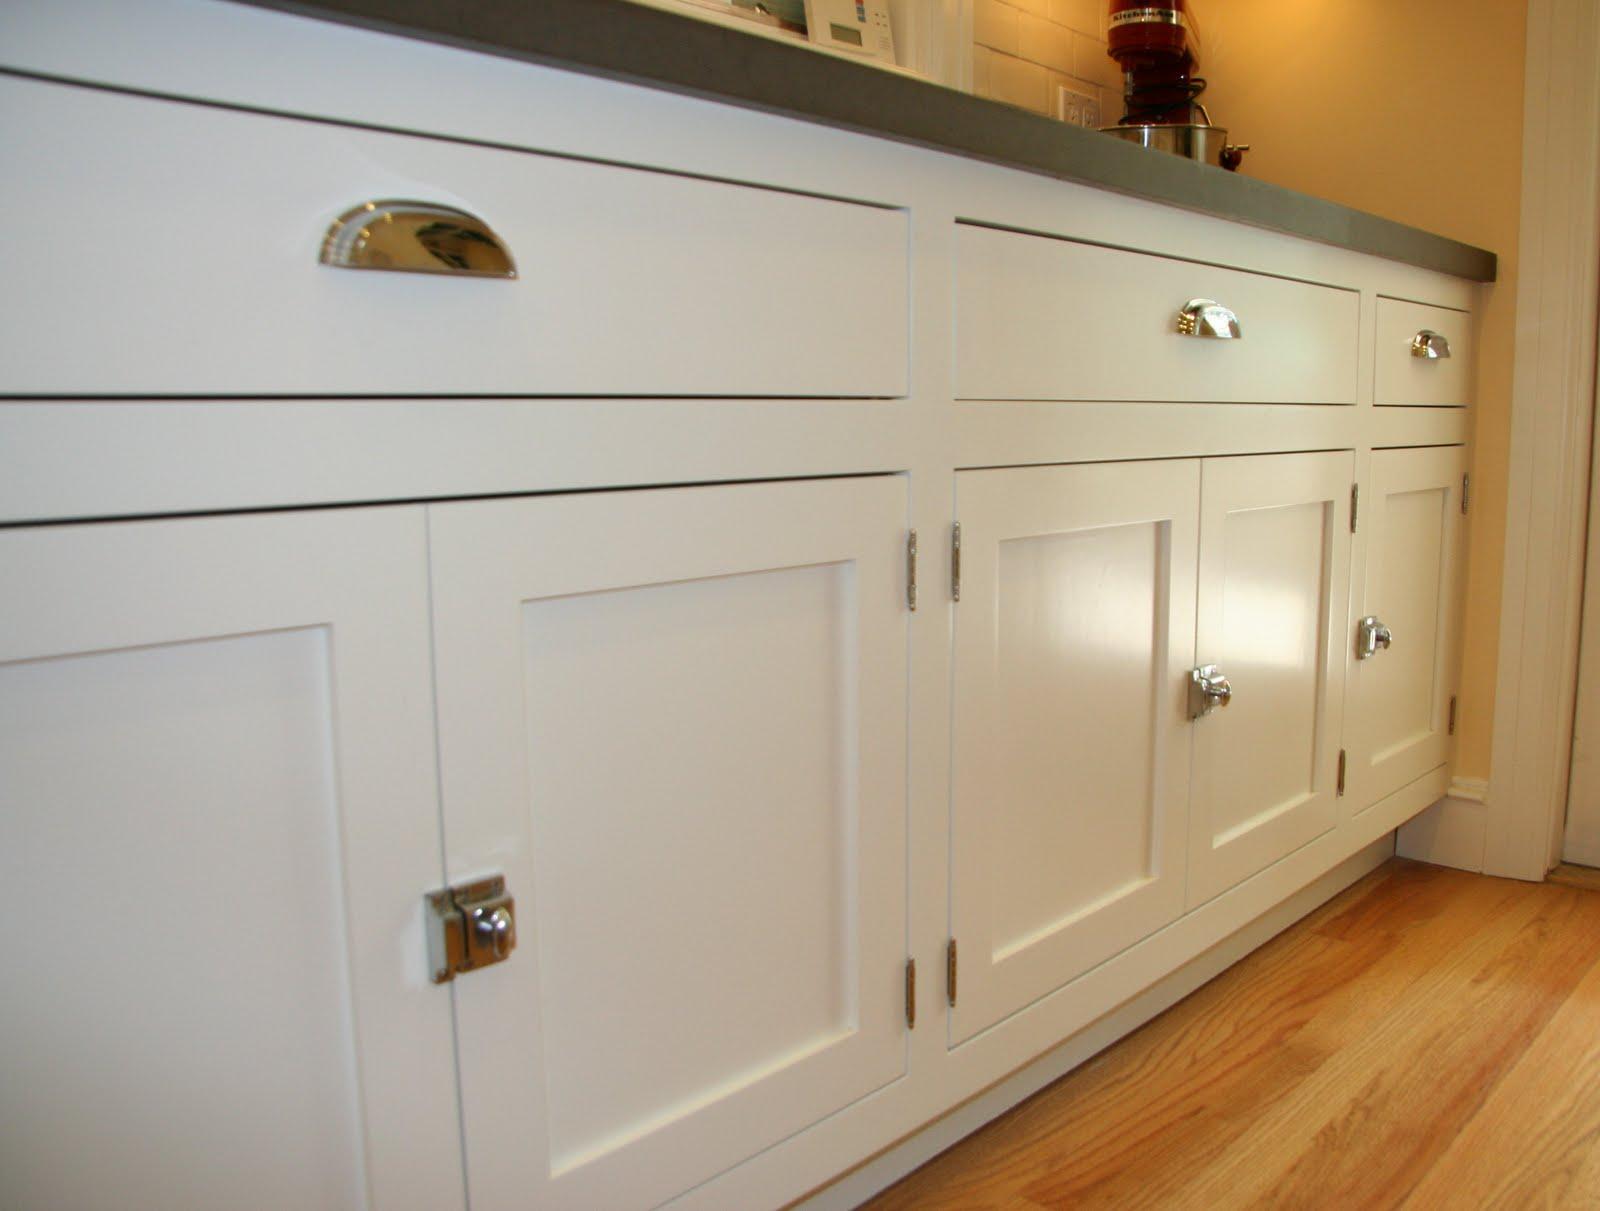 Ikea Shaker Kitchen Interior Design Decor